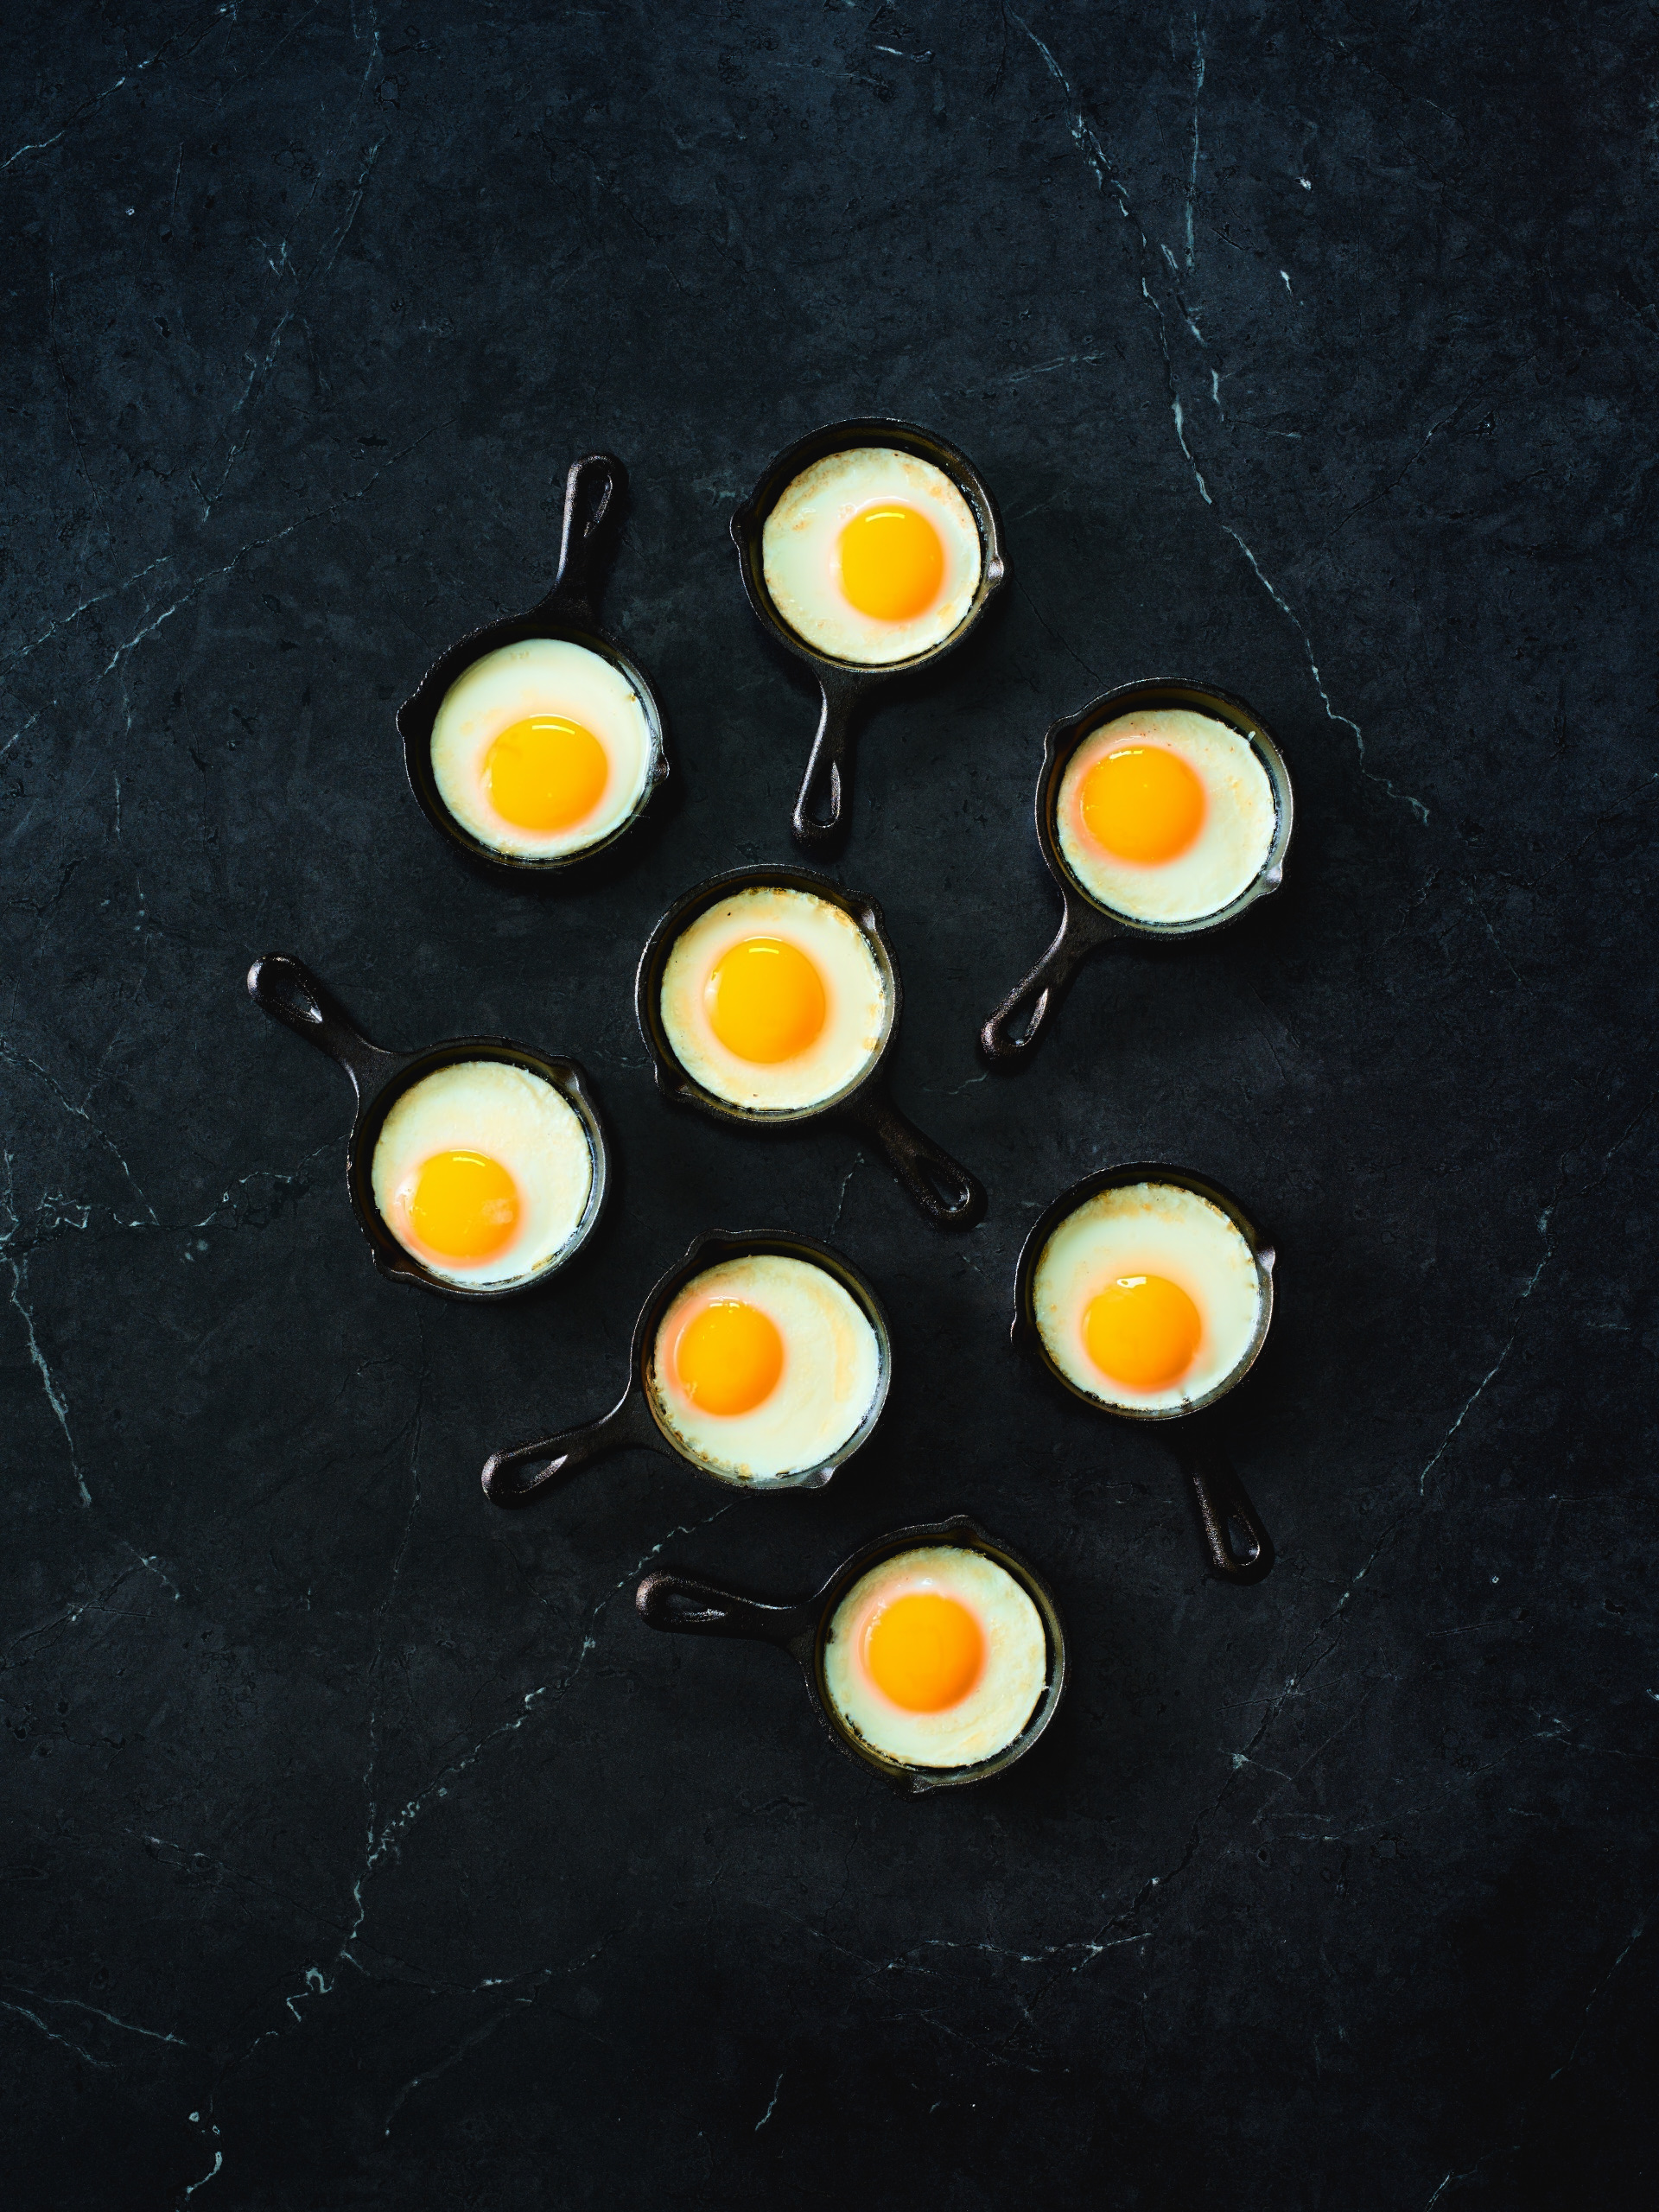 Lodge_Eggs_1339.jpg